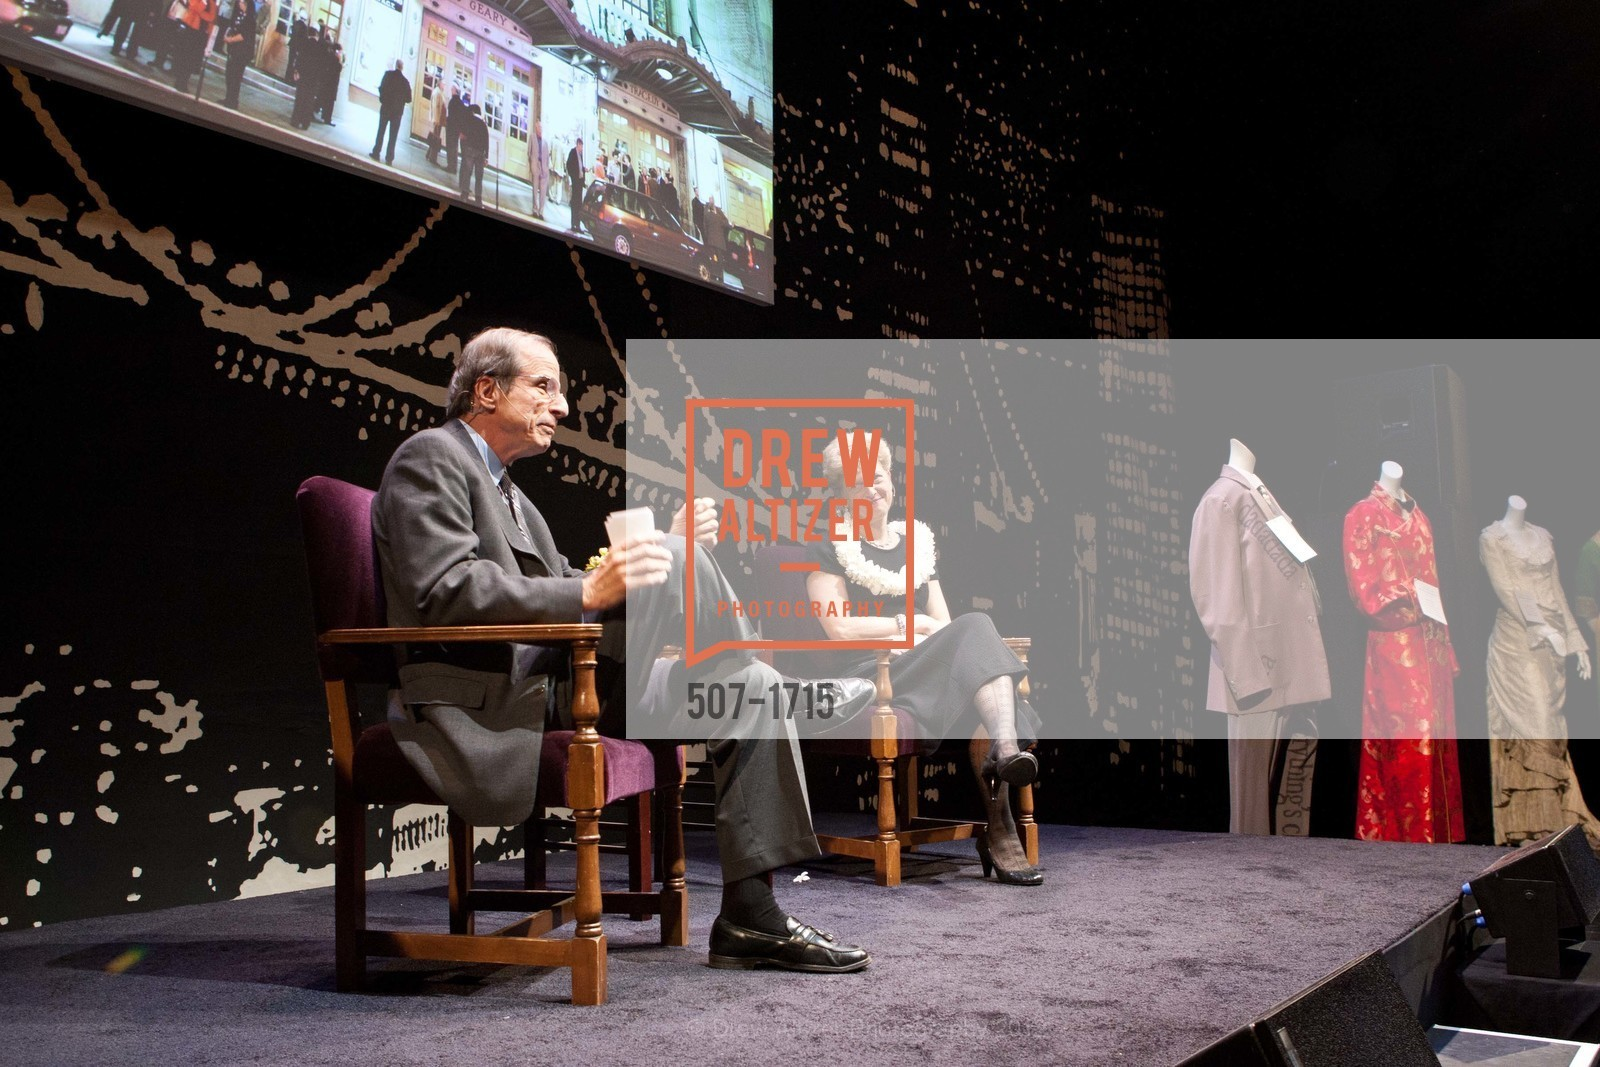 Michael Krasny, Carey Perloff, Photo #507-1715